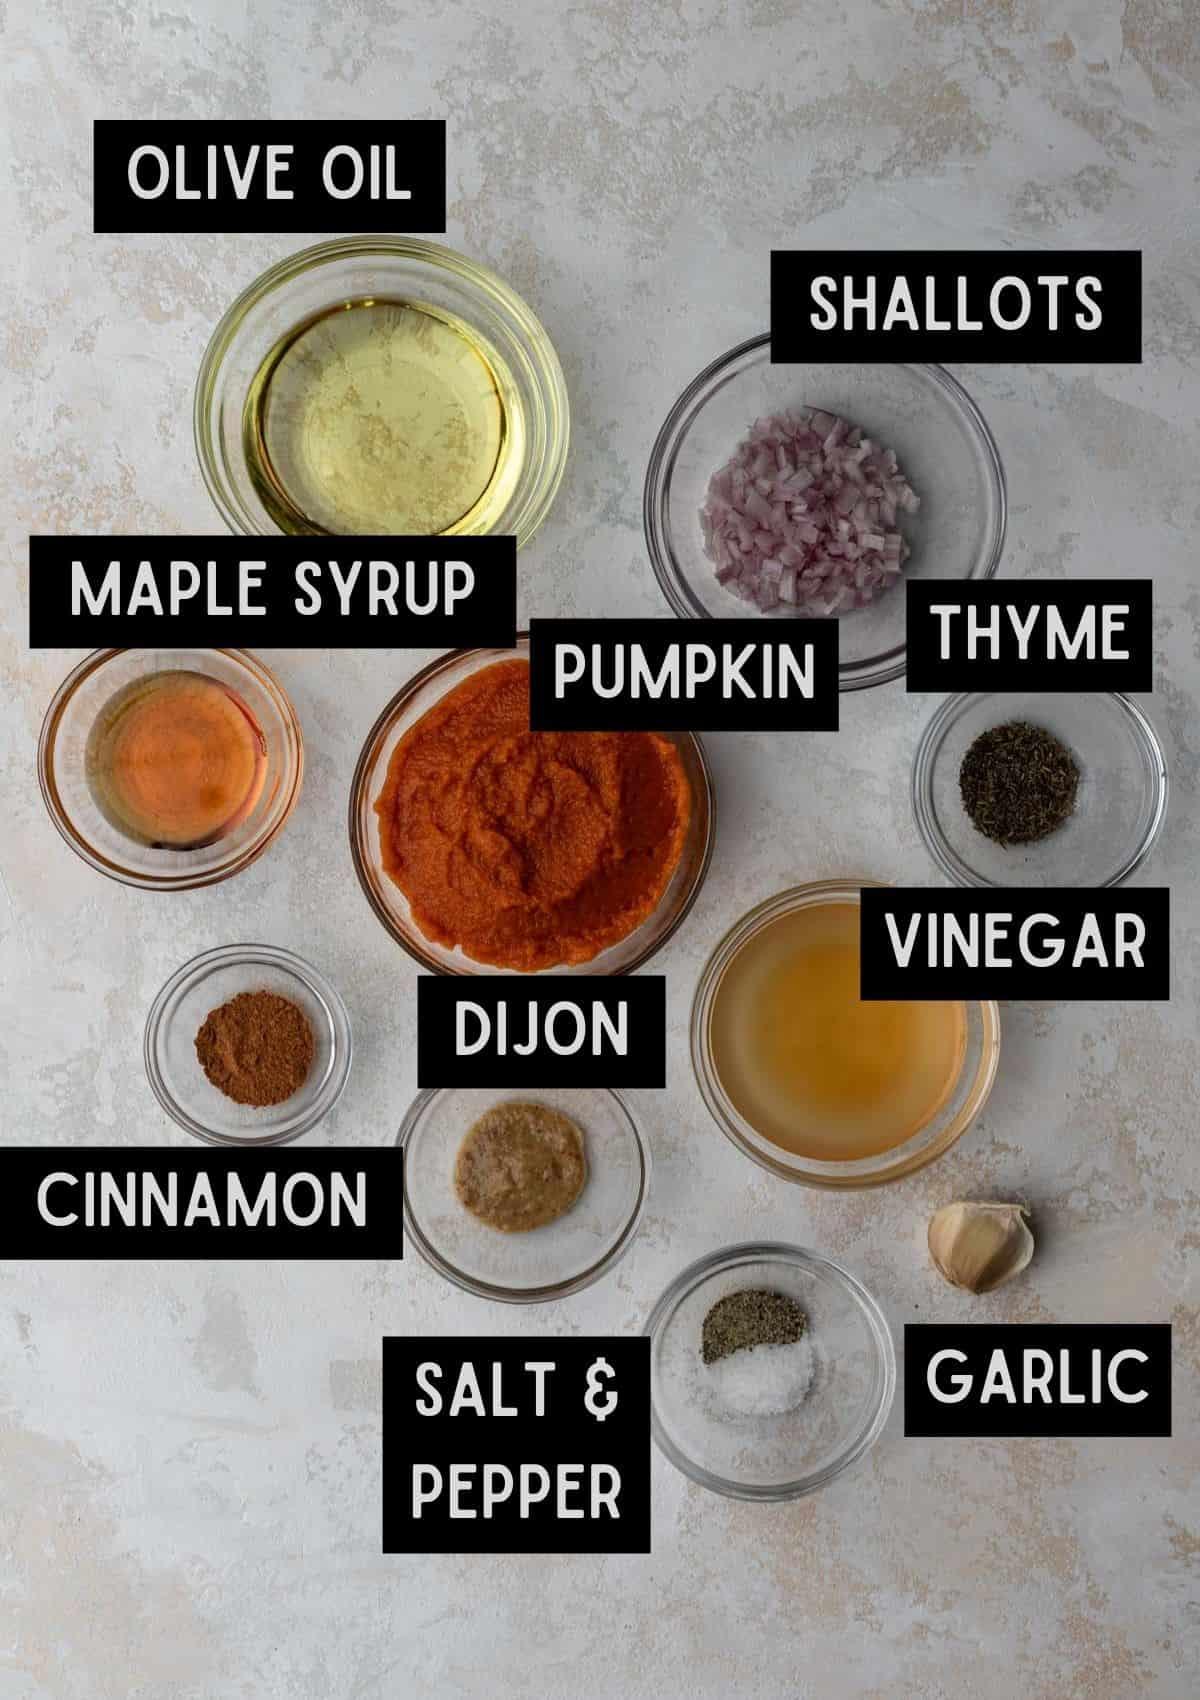 Labelled ingredients for pumpkin salad dressing (see recipe for details).